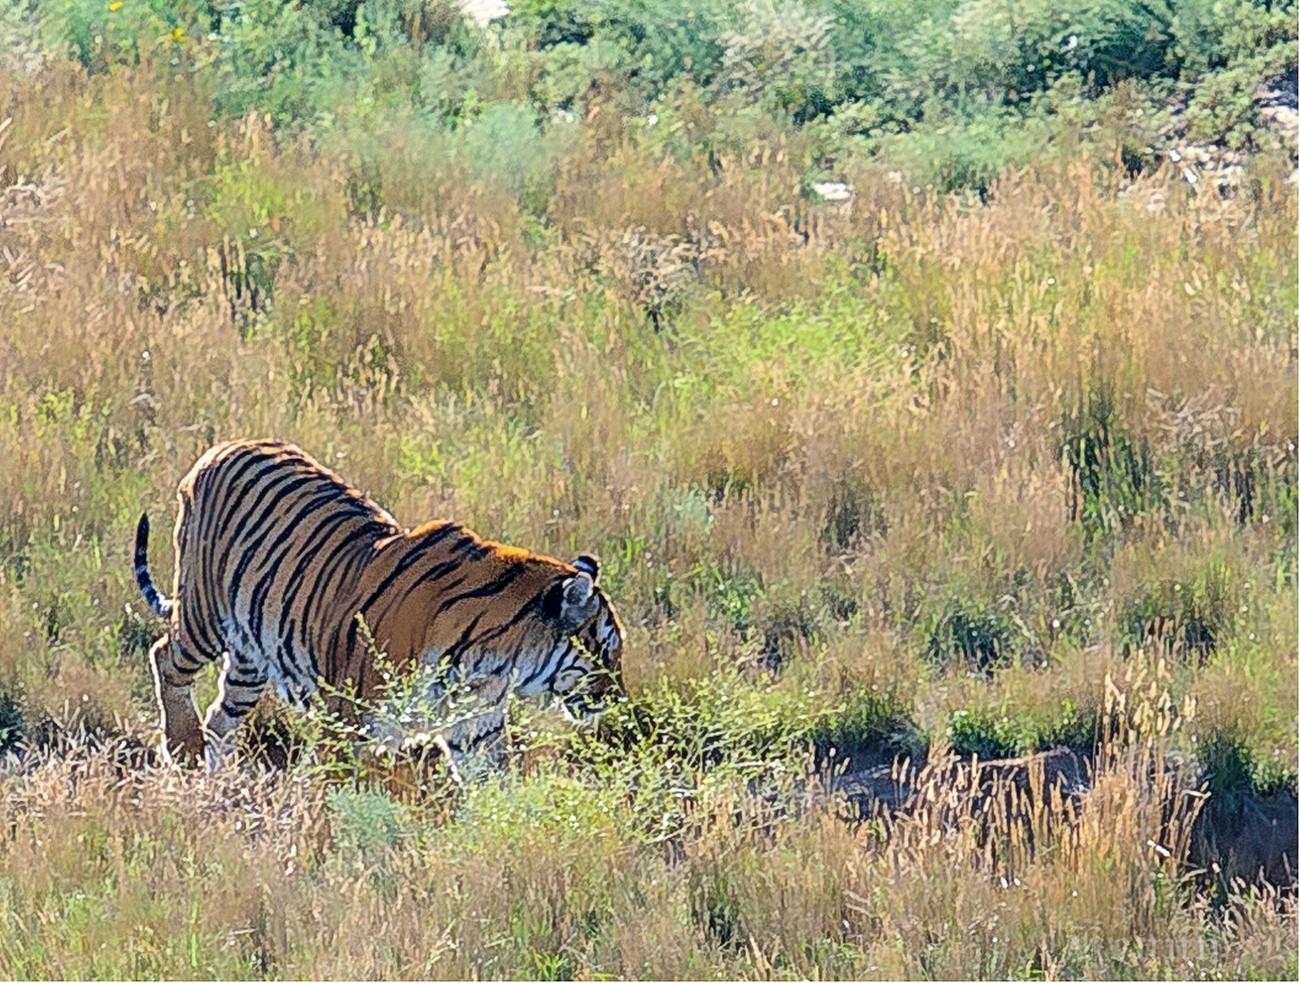 Wandering Tiger-2